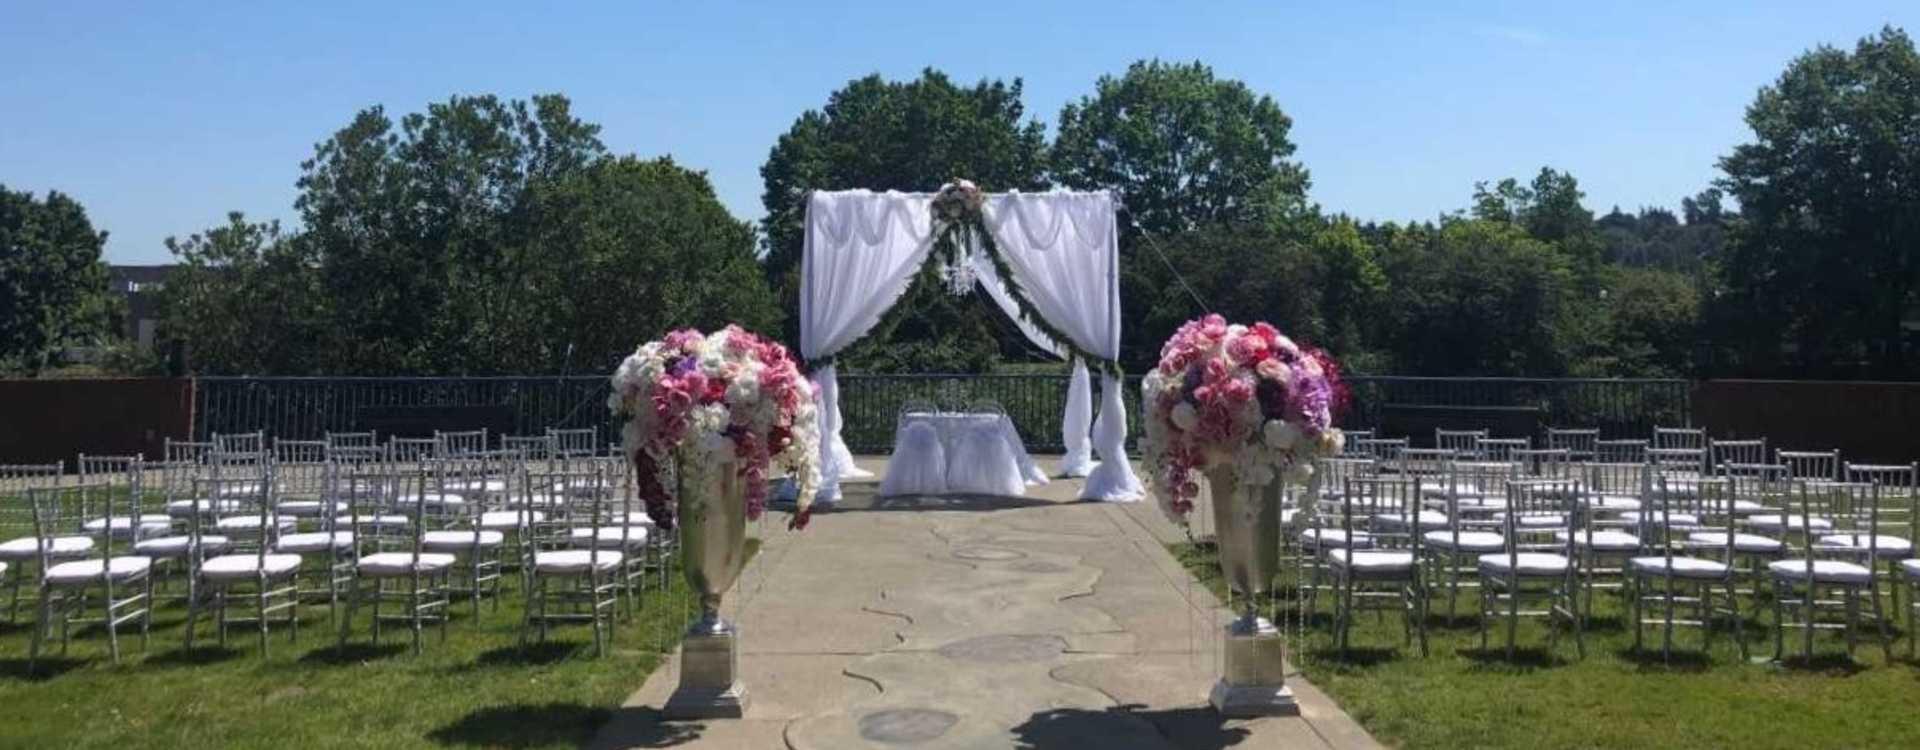 Outdoor Wedding at Tukwila Community Center